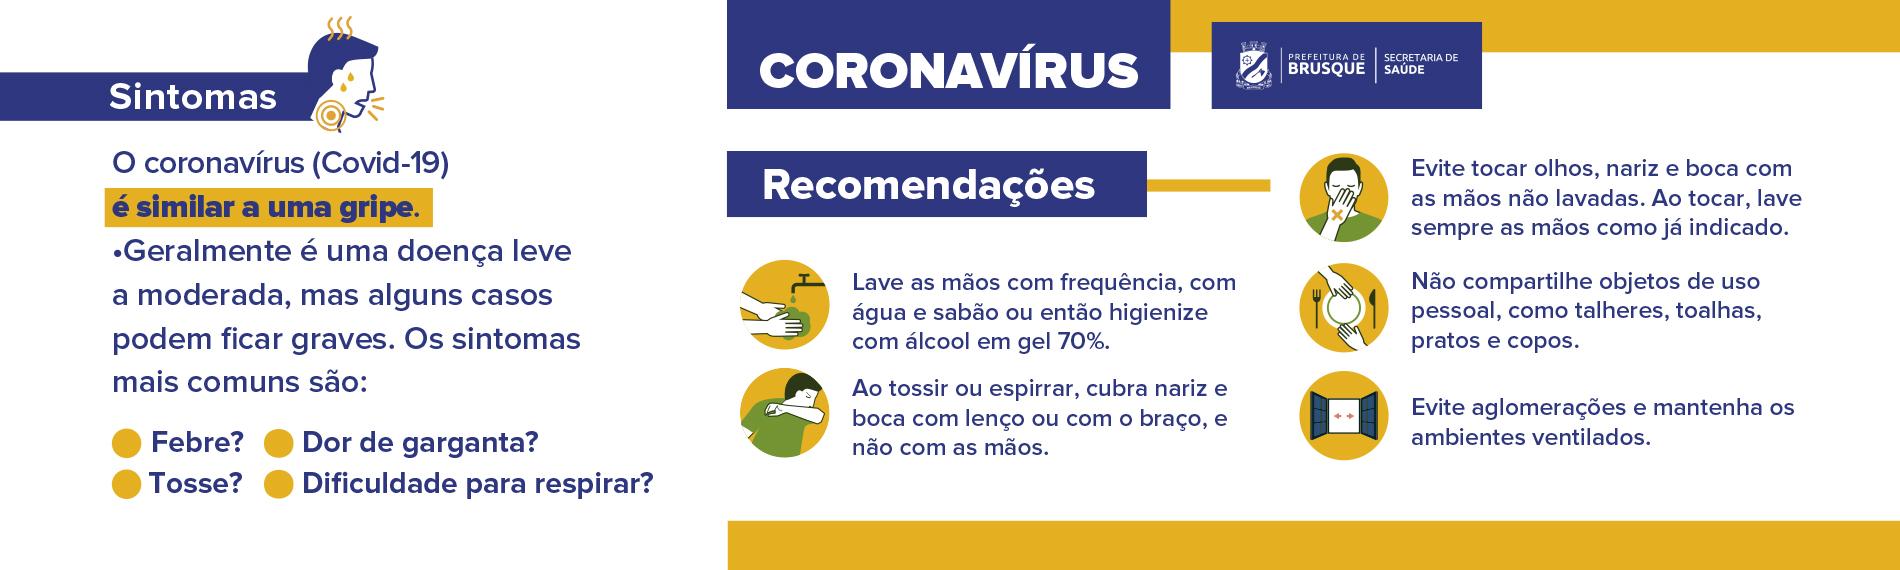 Banner Corona – Recomendações